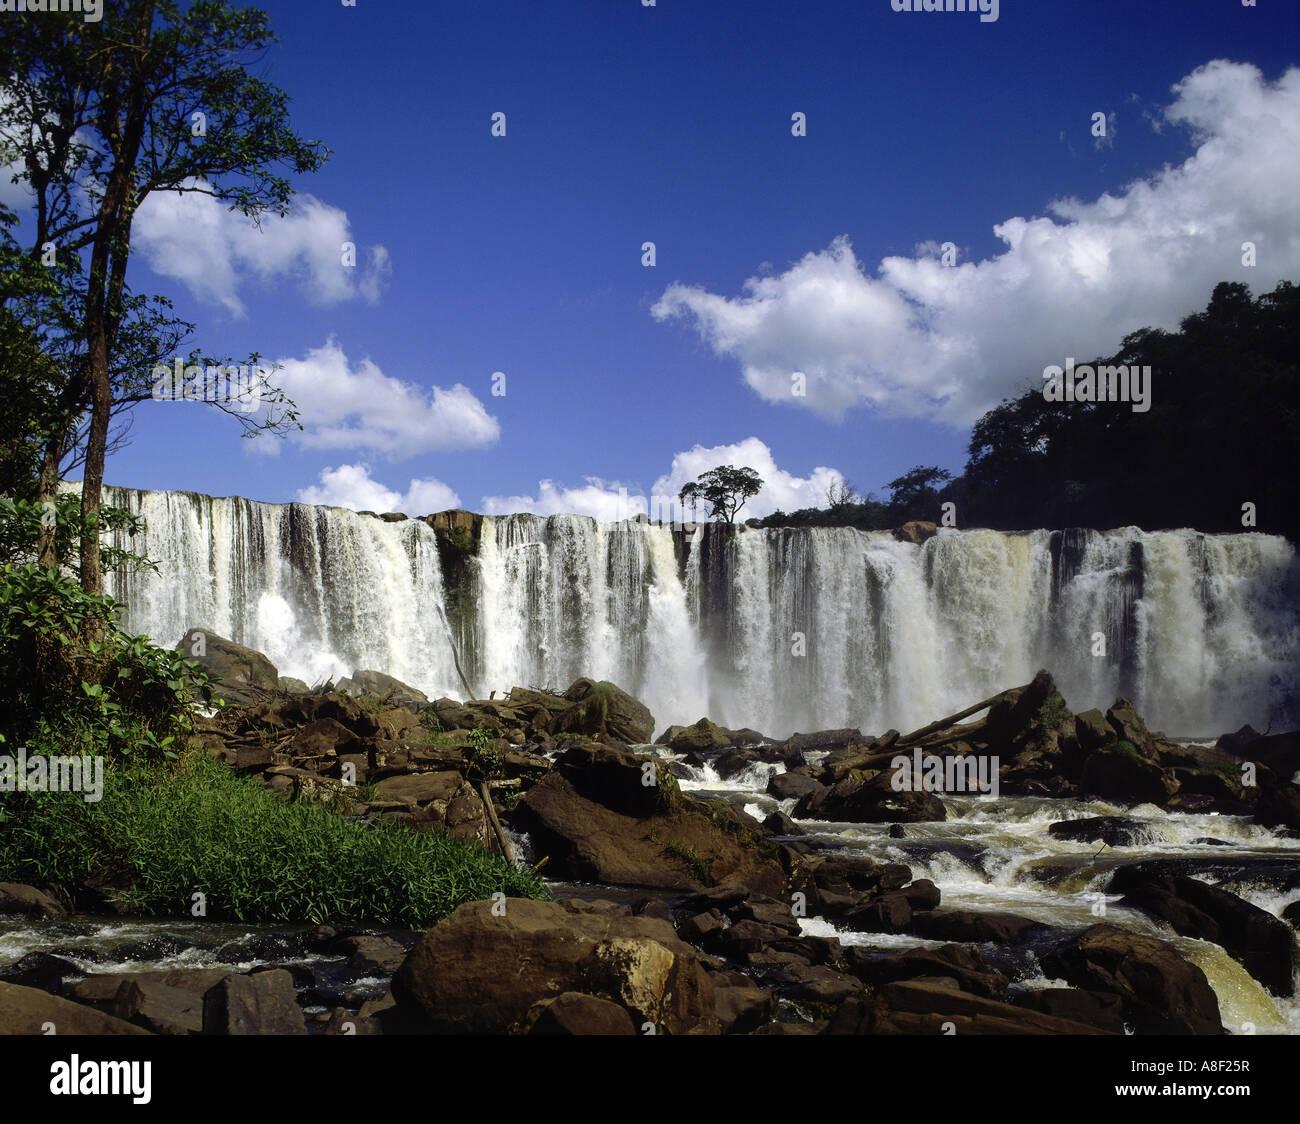 Geography Travel Brazil Landscapes Parana Waterfalls